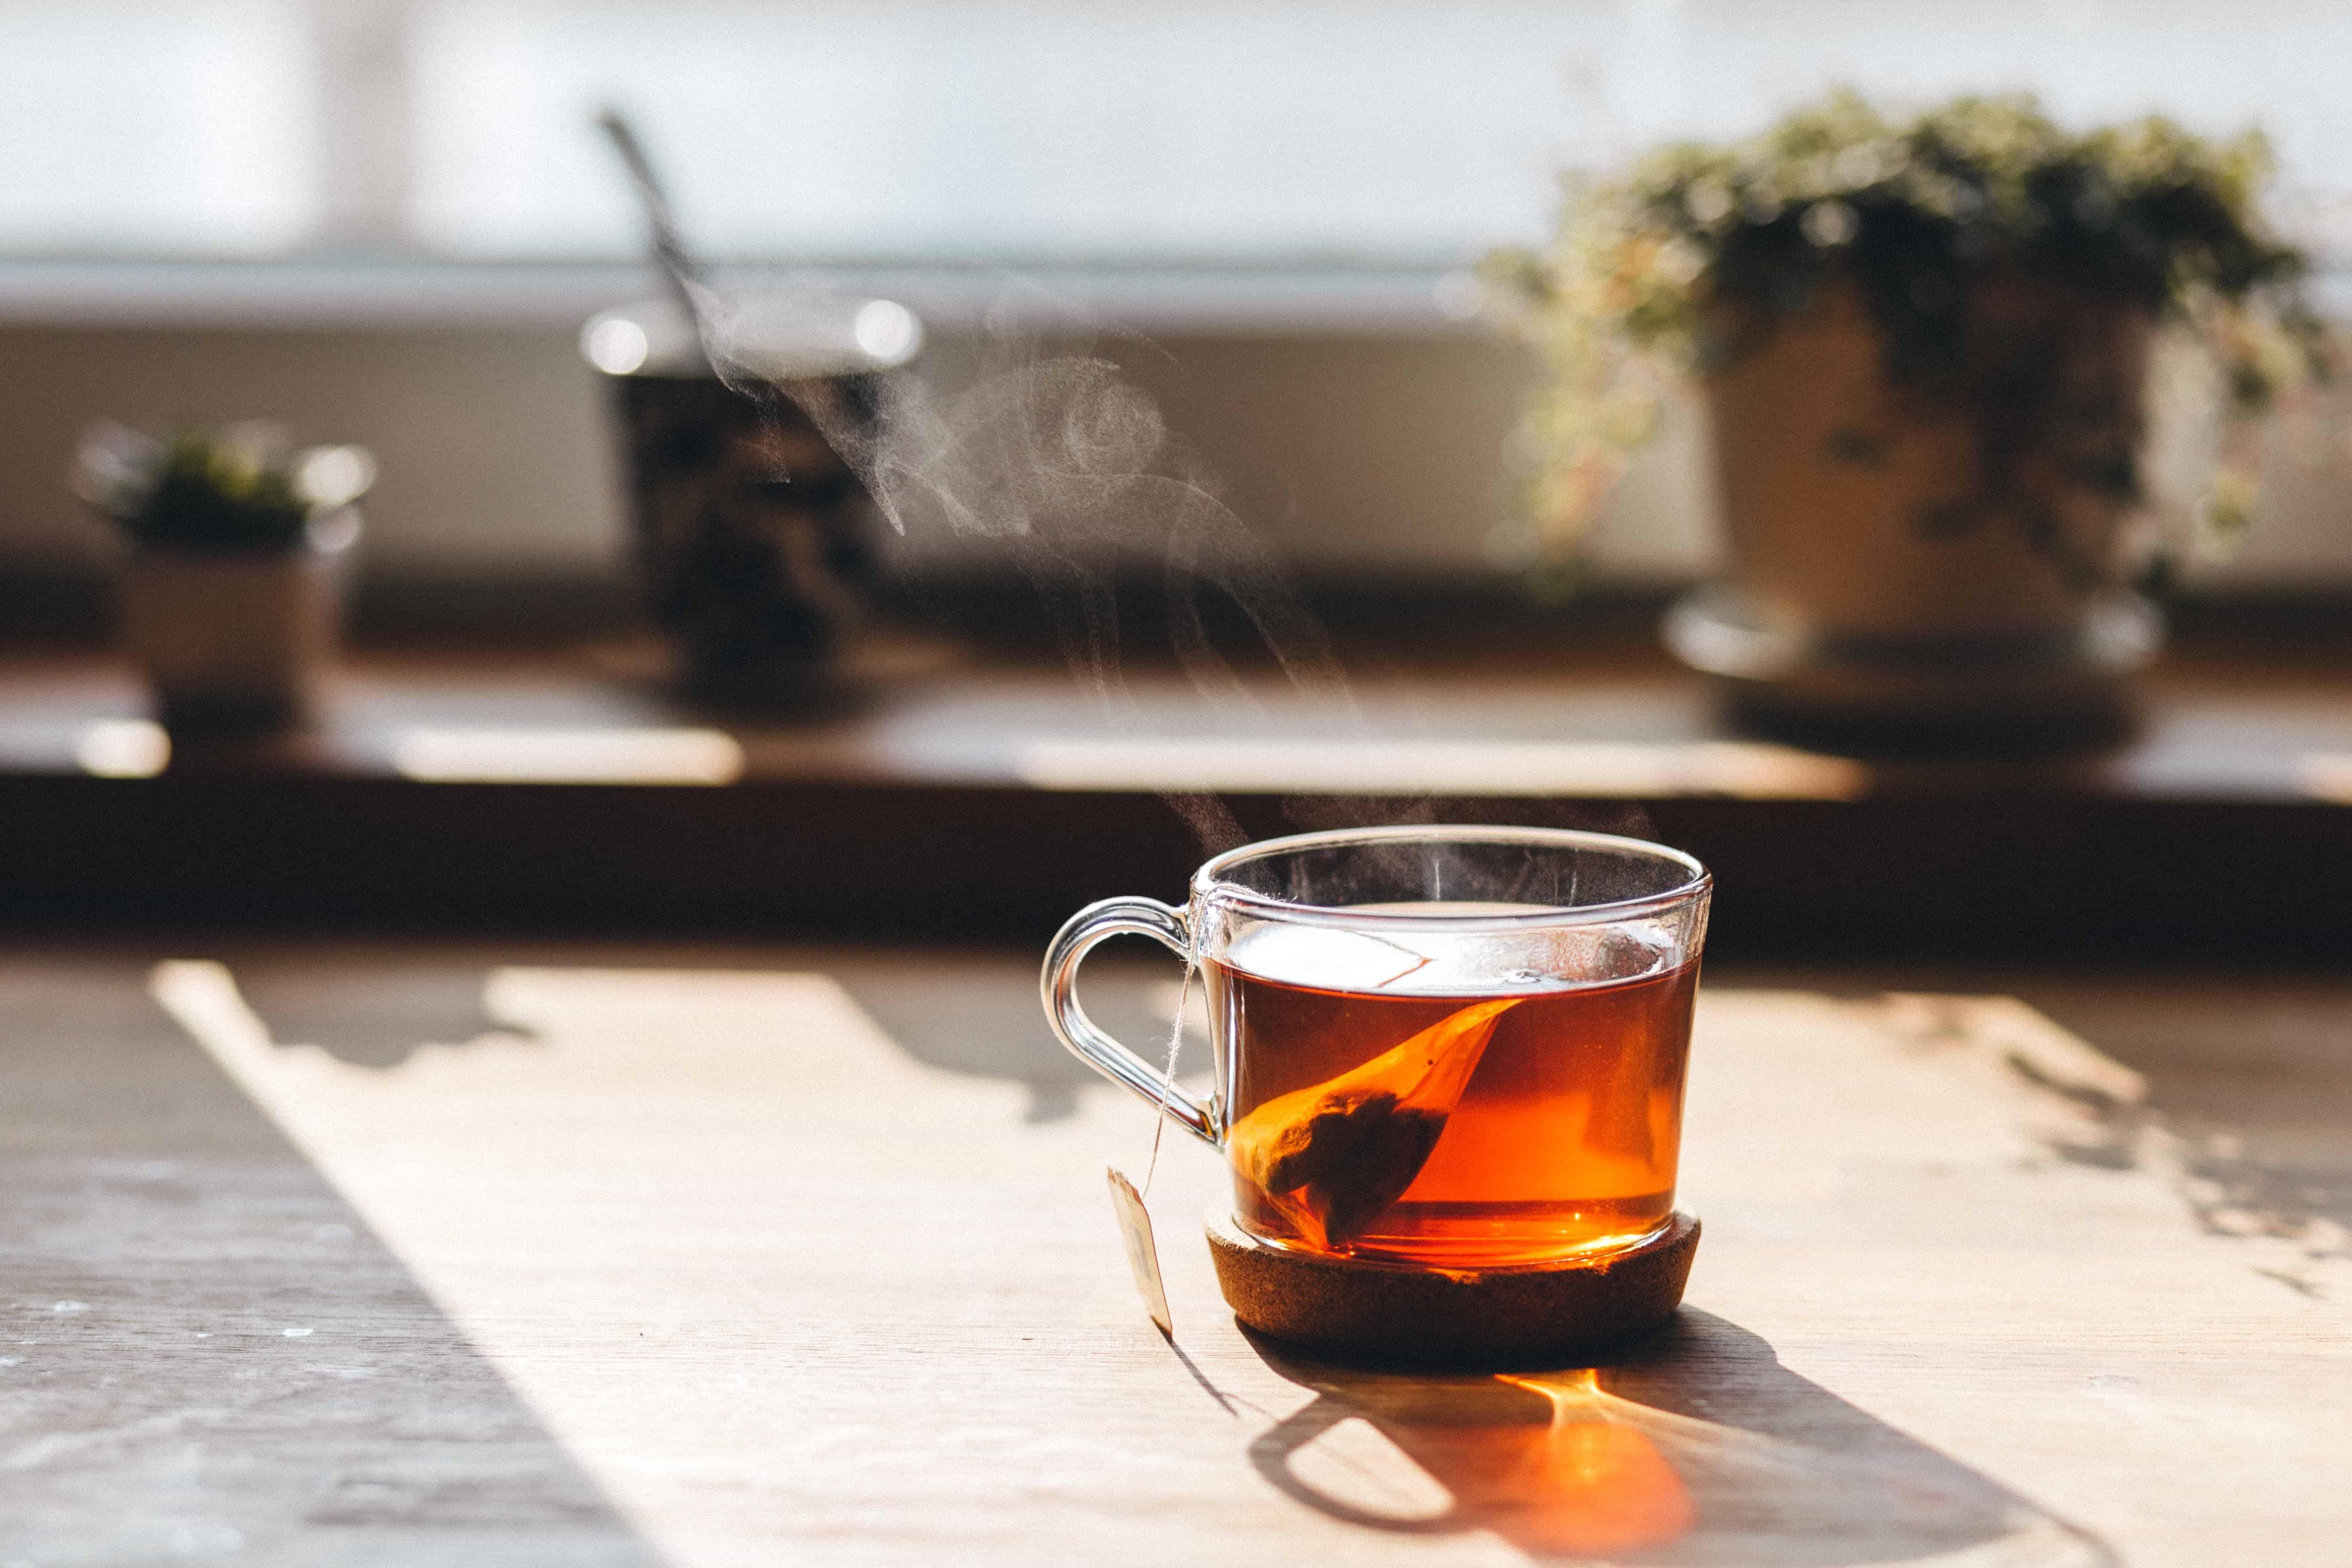 Free picture window tea cup table breakfast drink